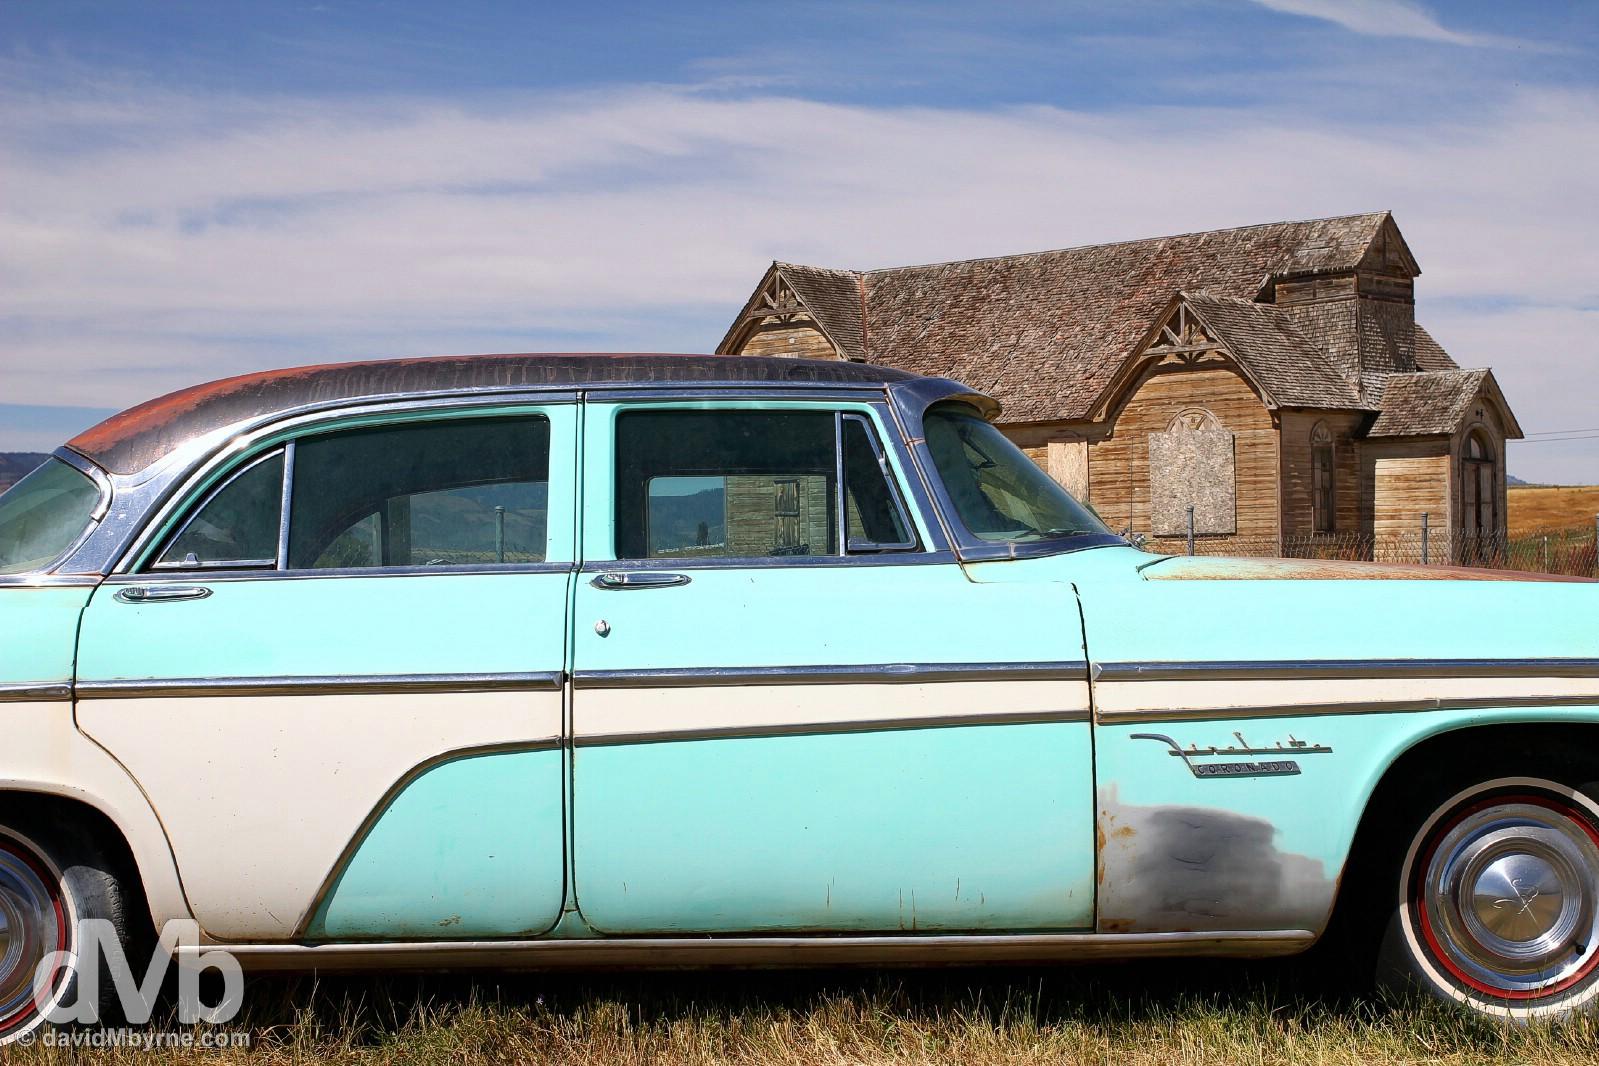 Abandoned - 1955 DeSoto & church. Montpelier, Idaho, USA. September 6, 2016.